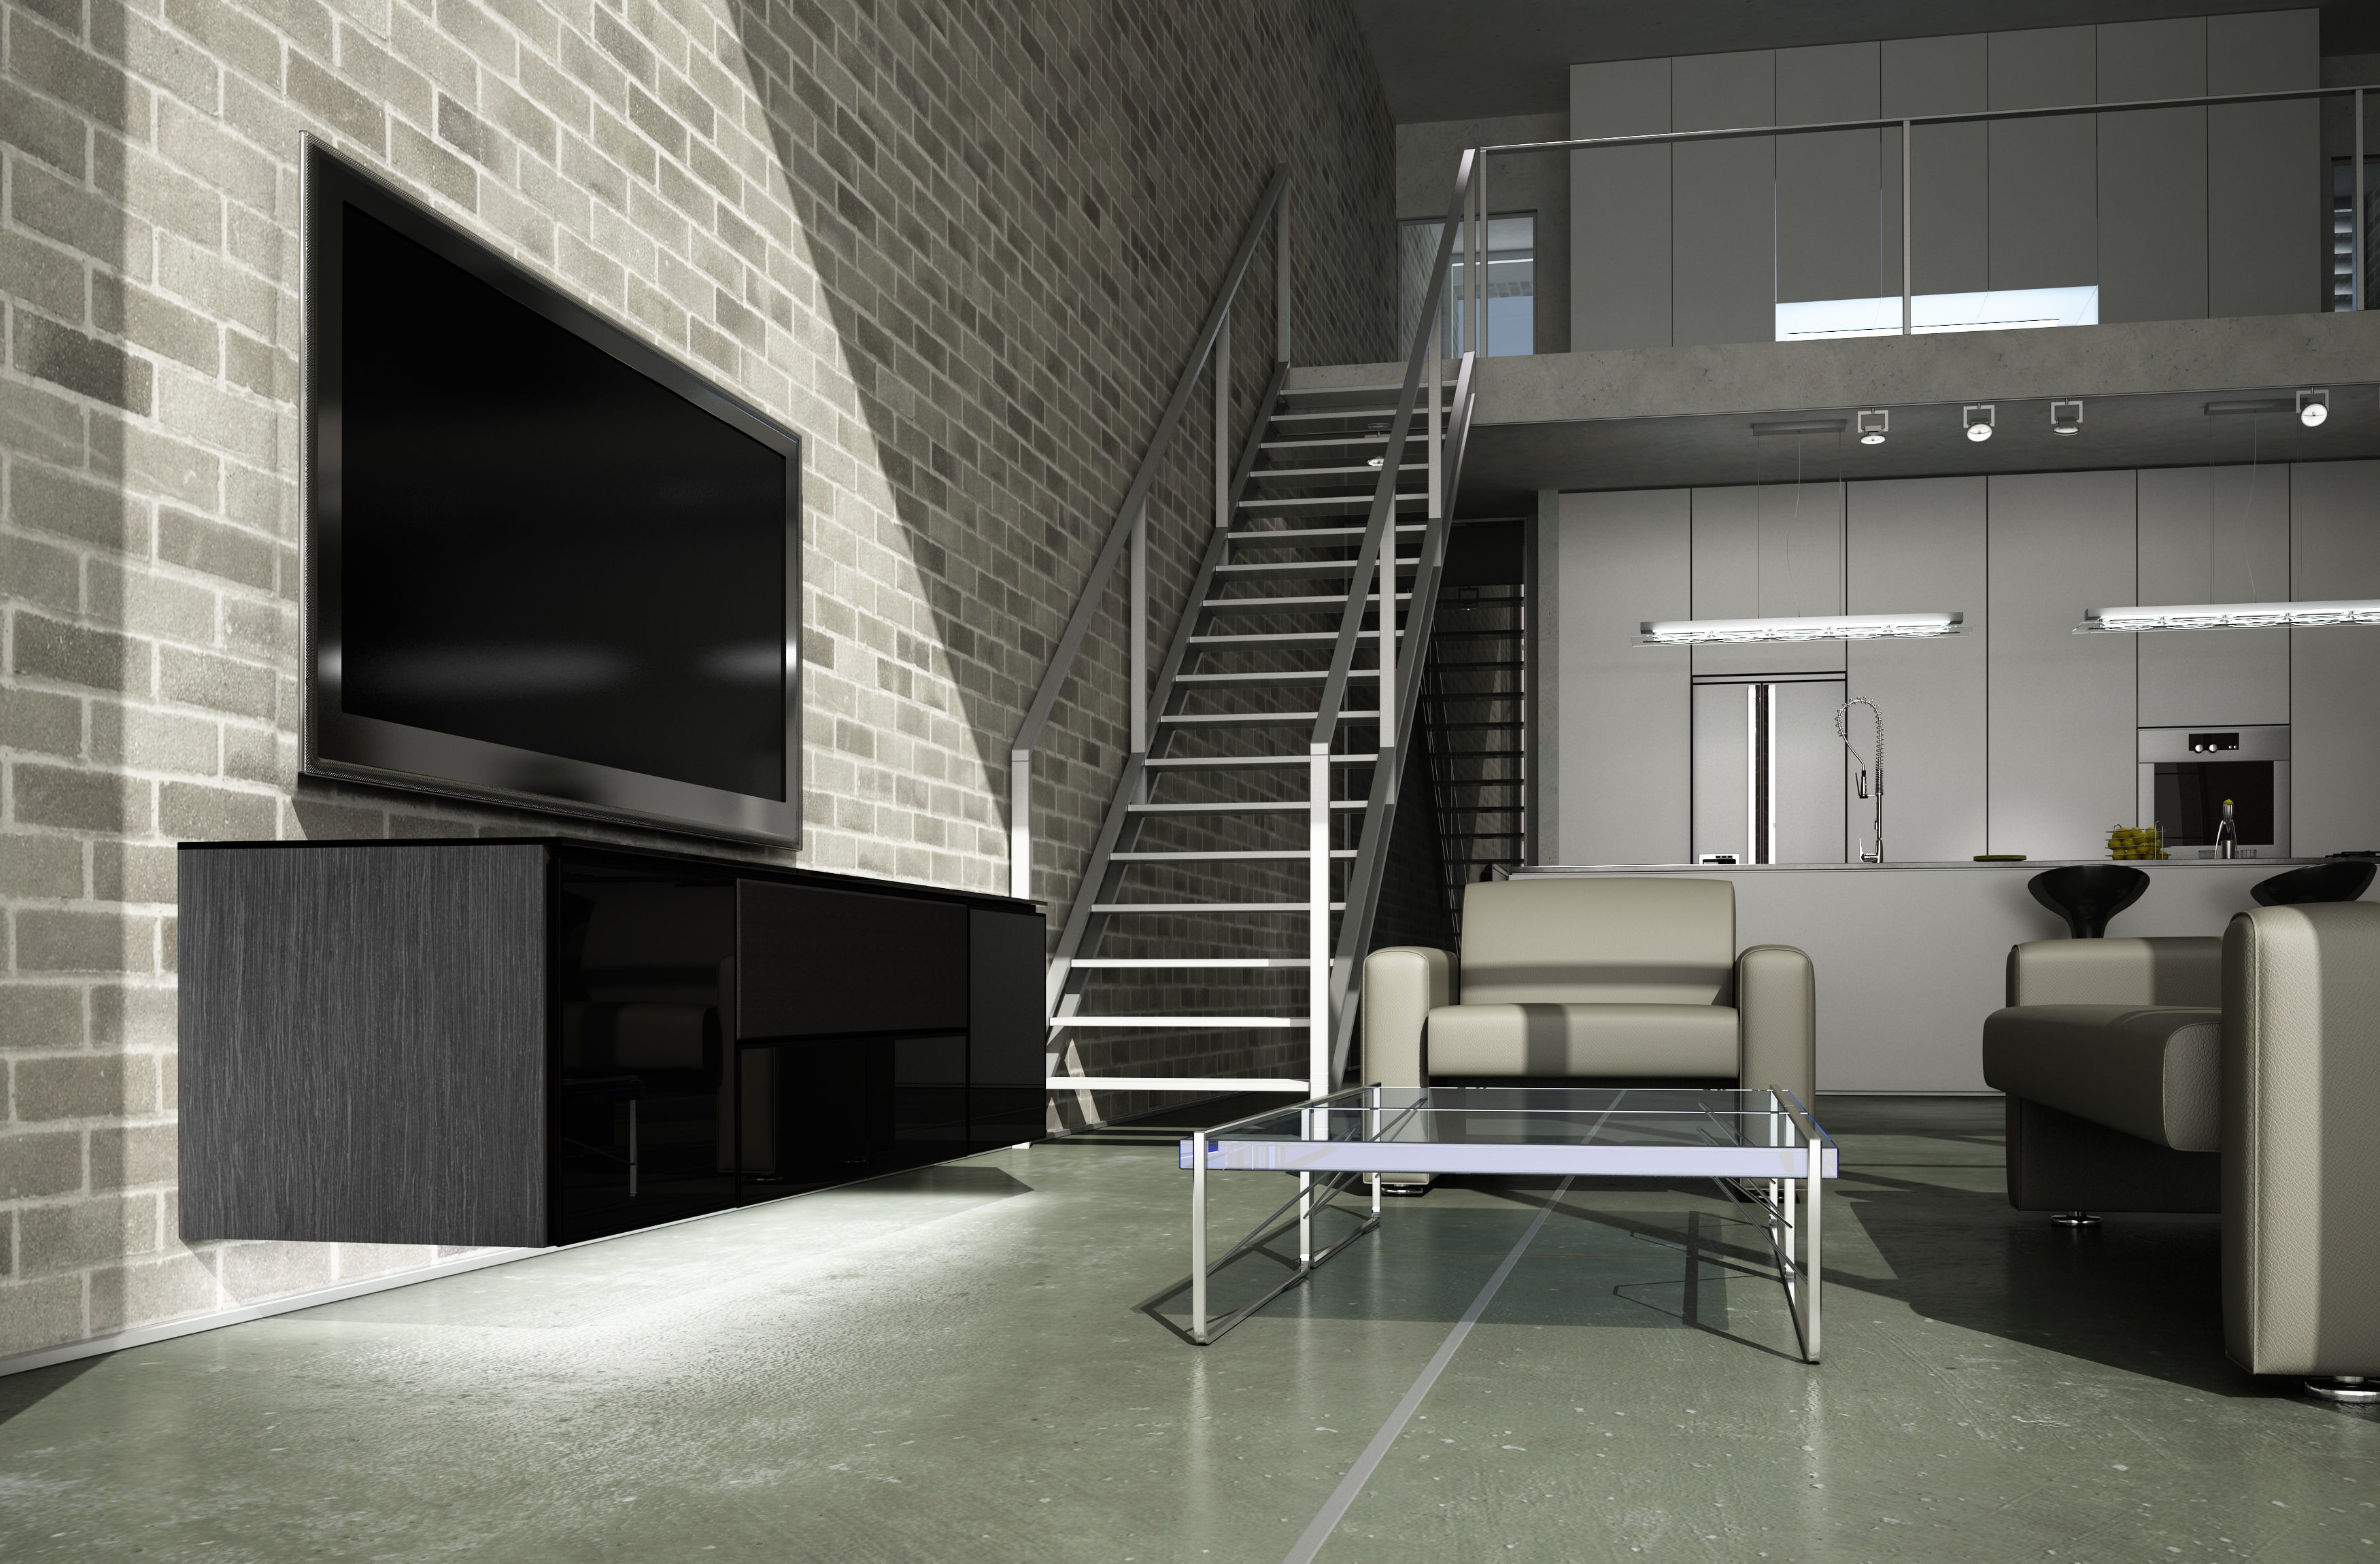 oslo-245-lifestyle-wall-vol8